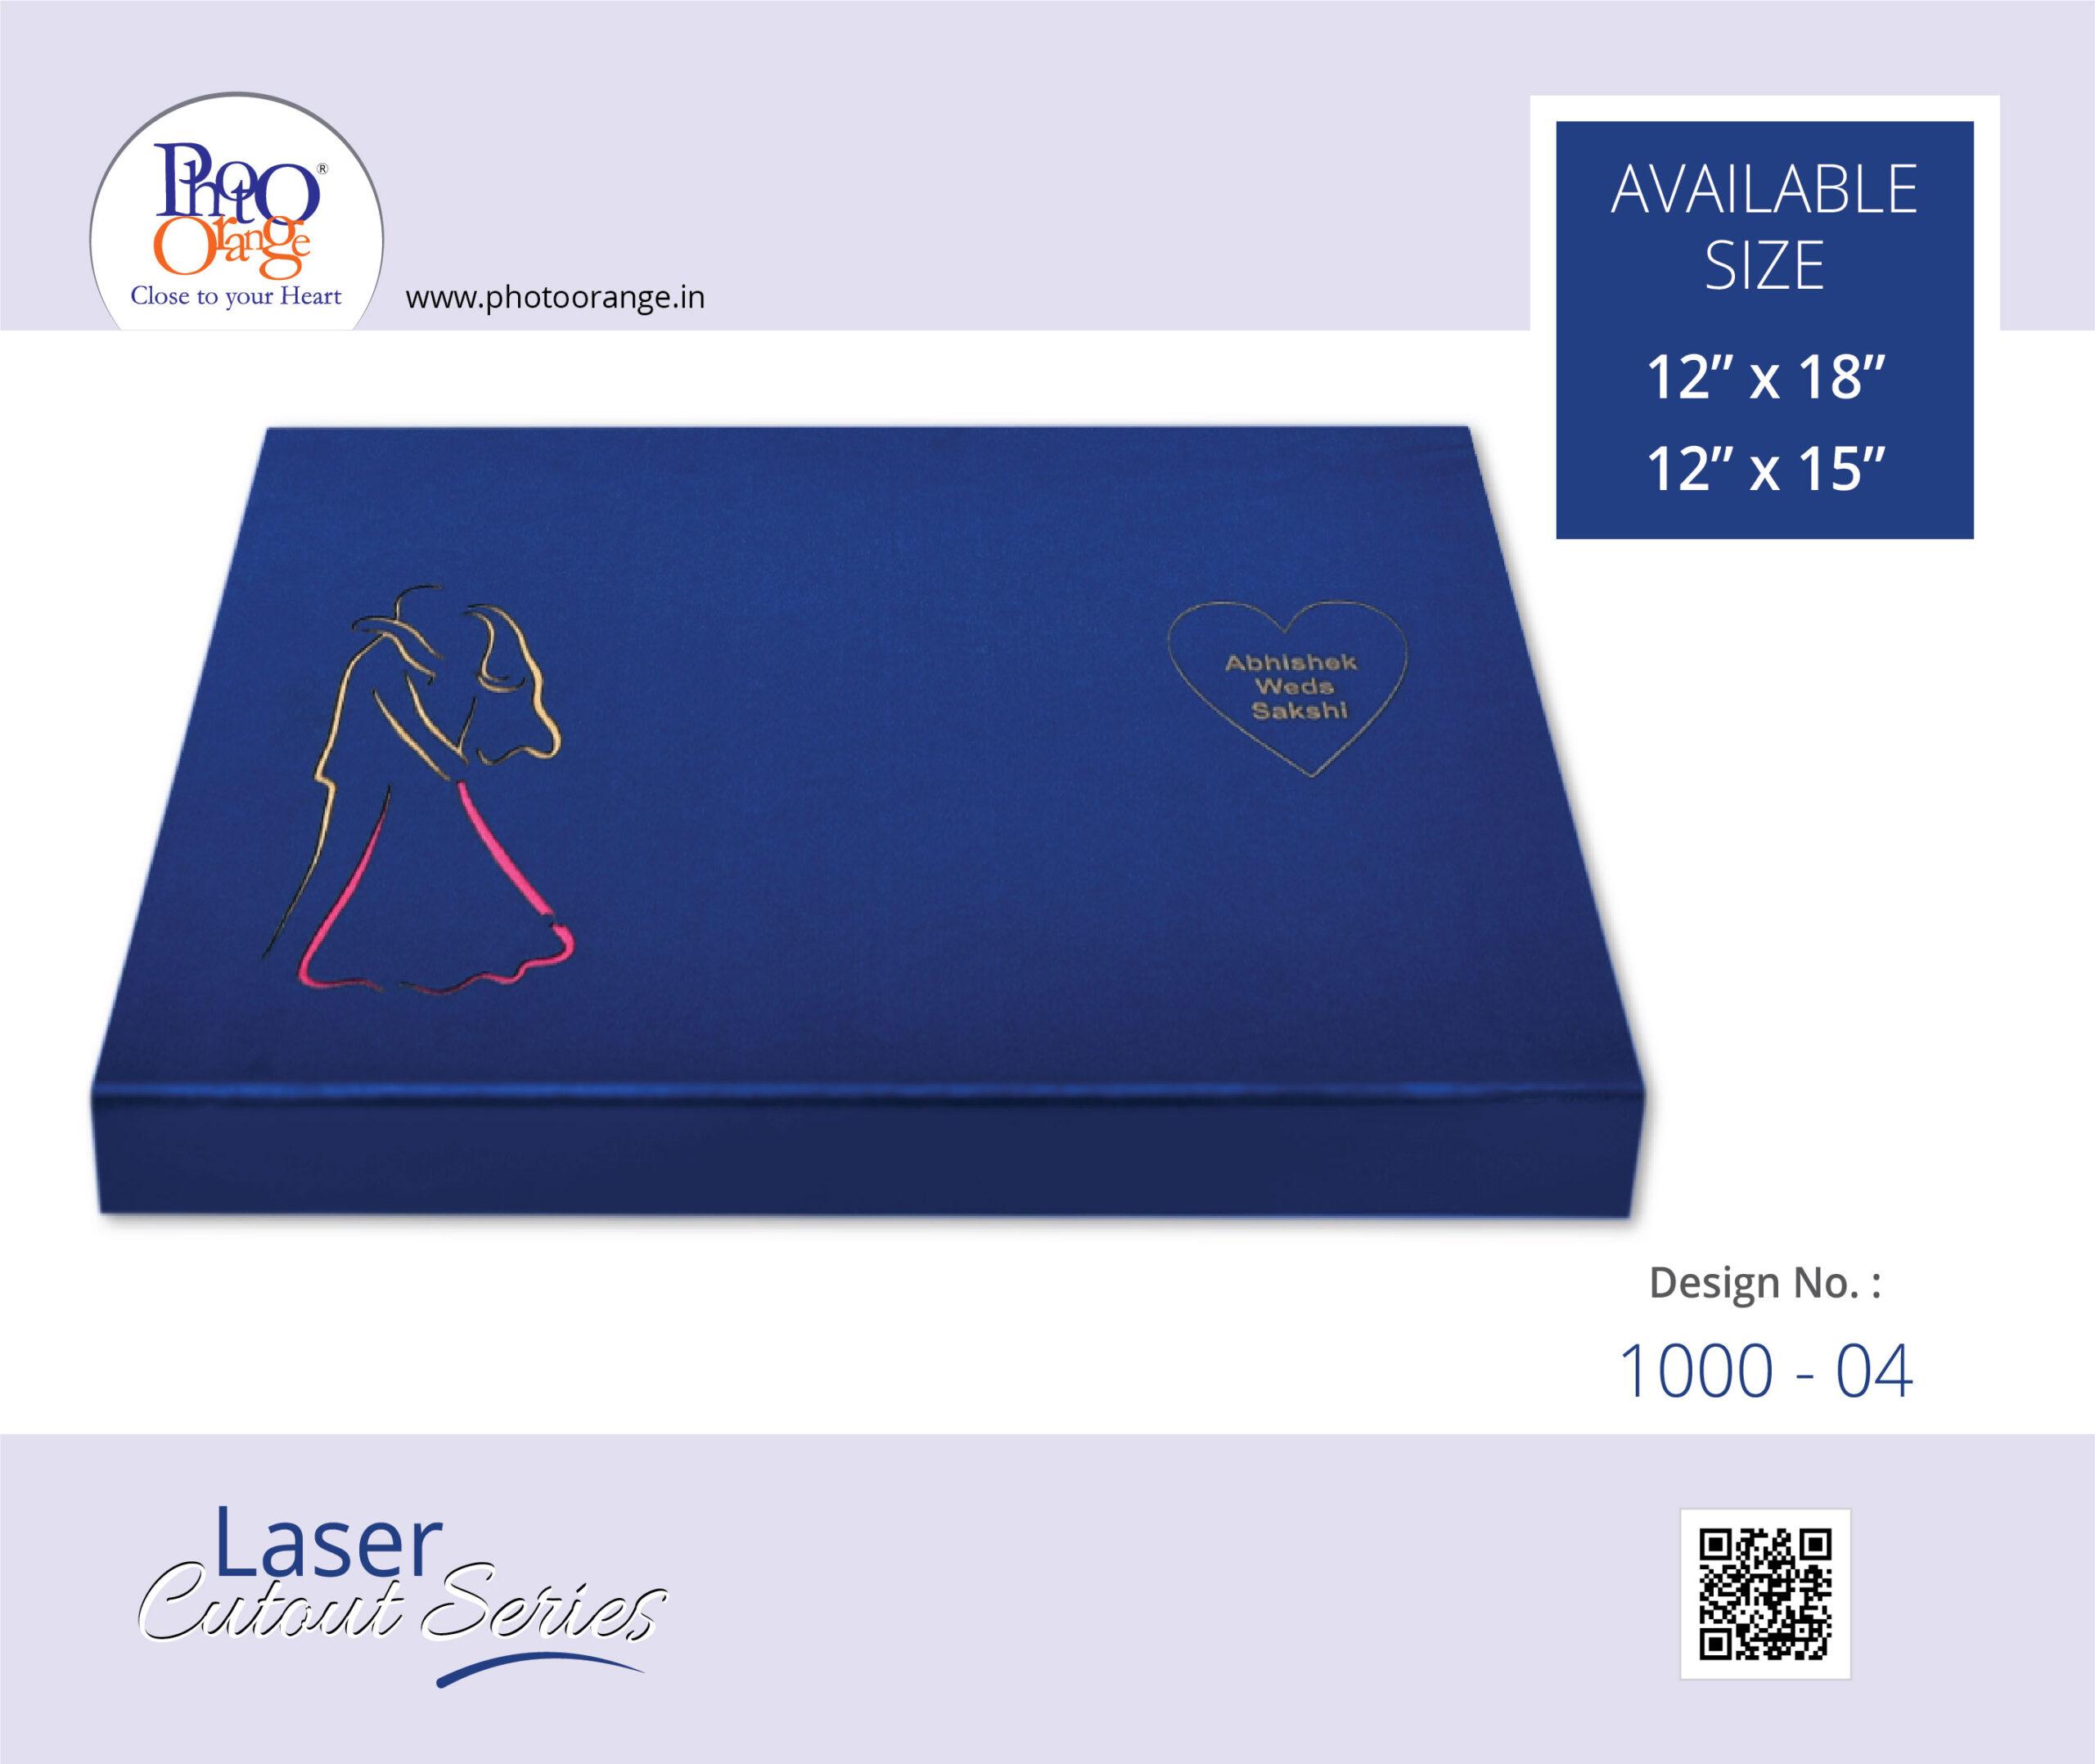 Laser Cutout Series 1000 04